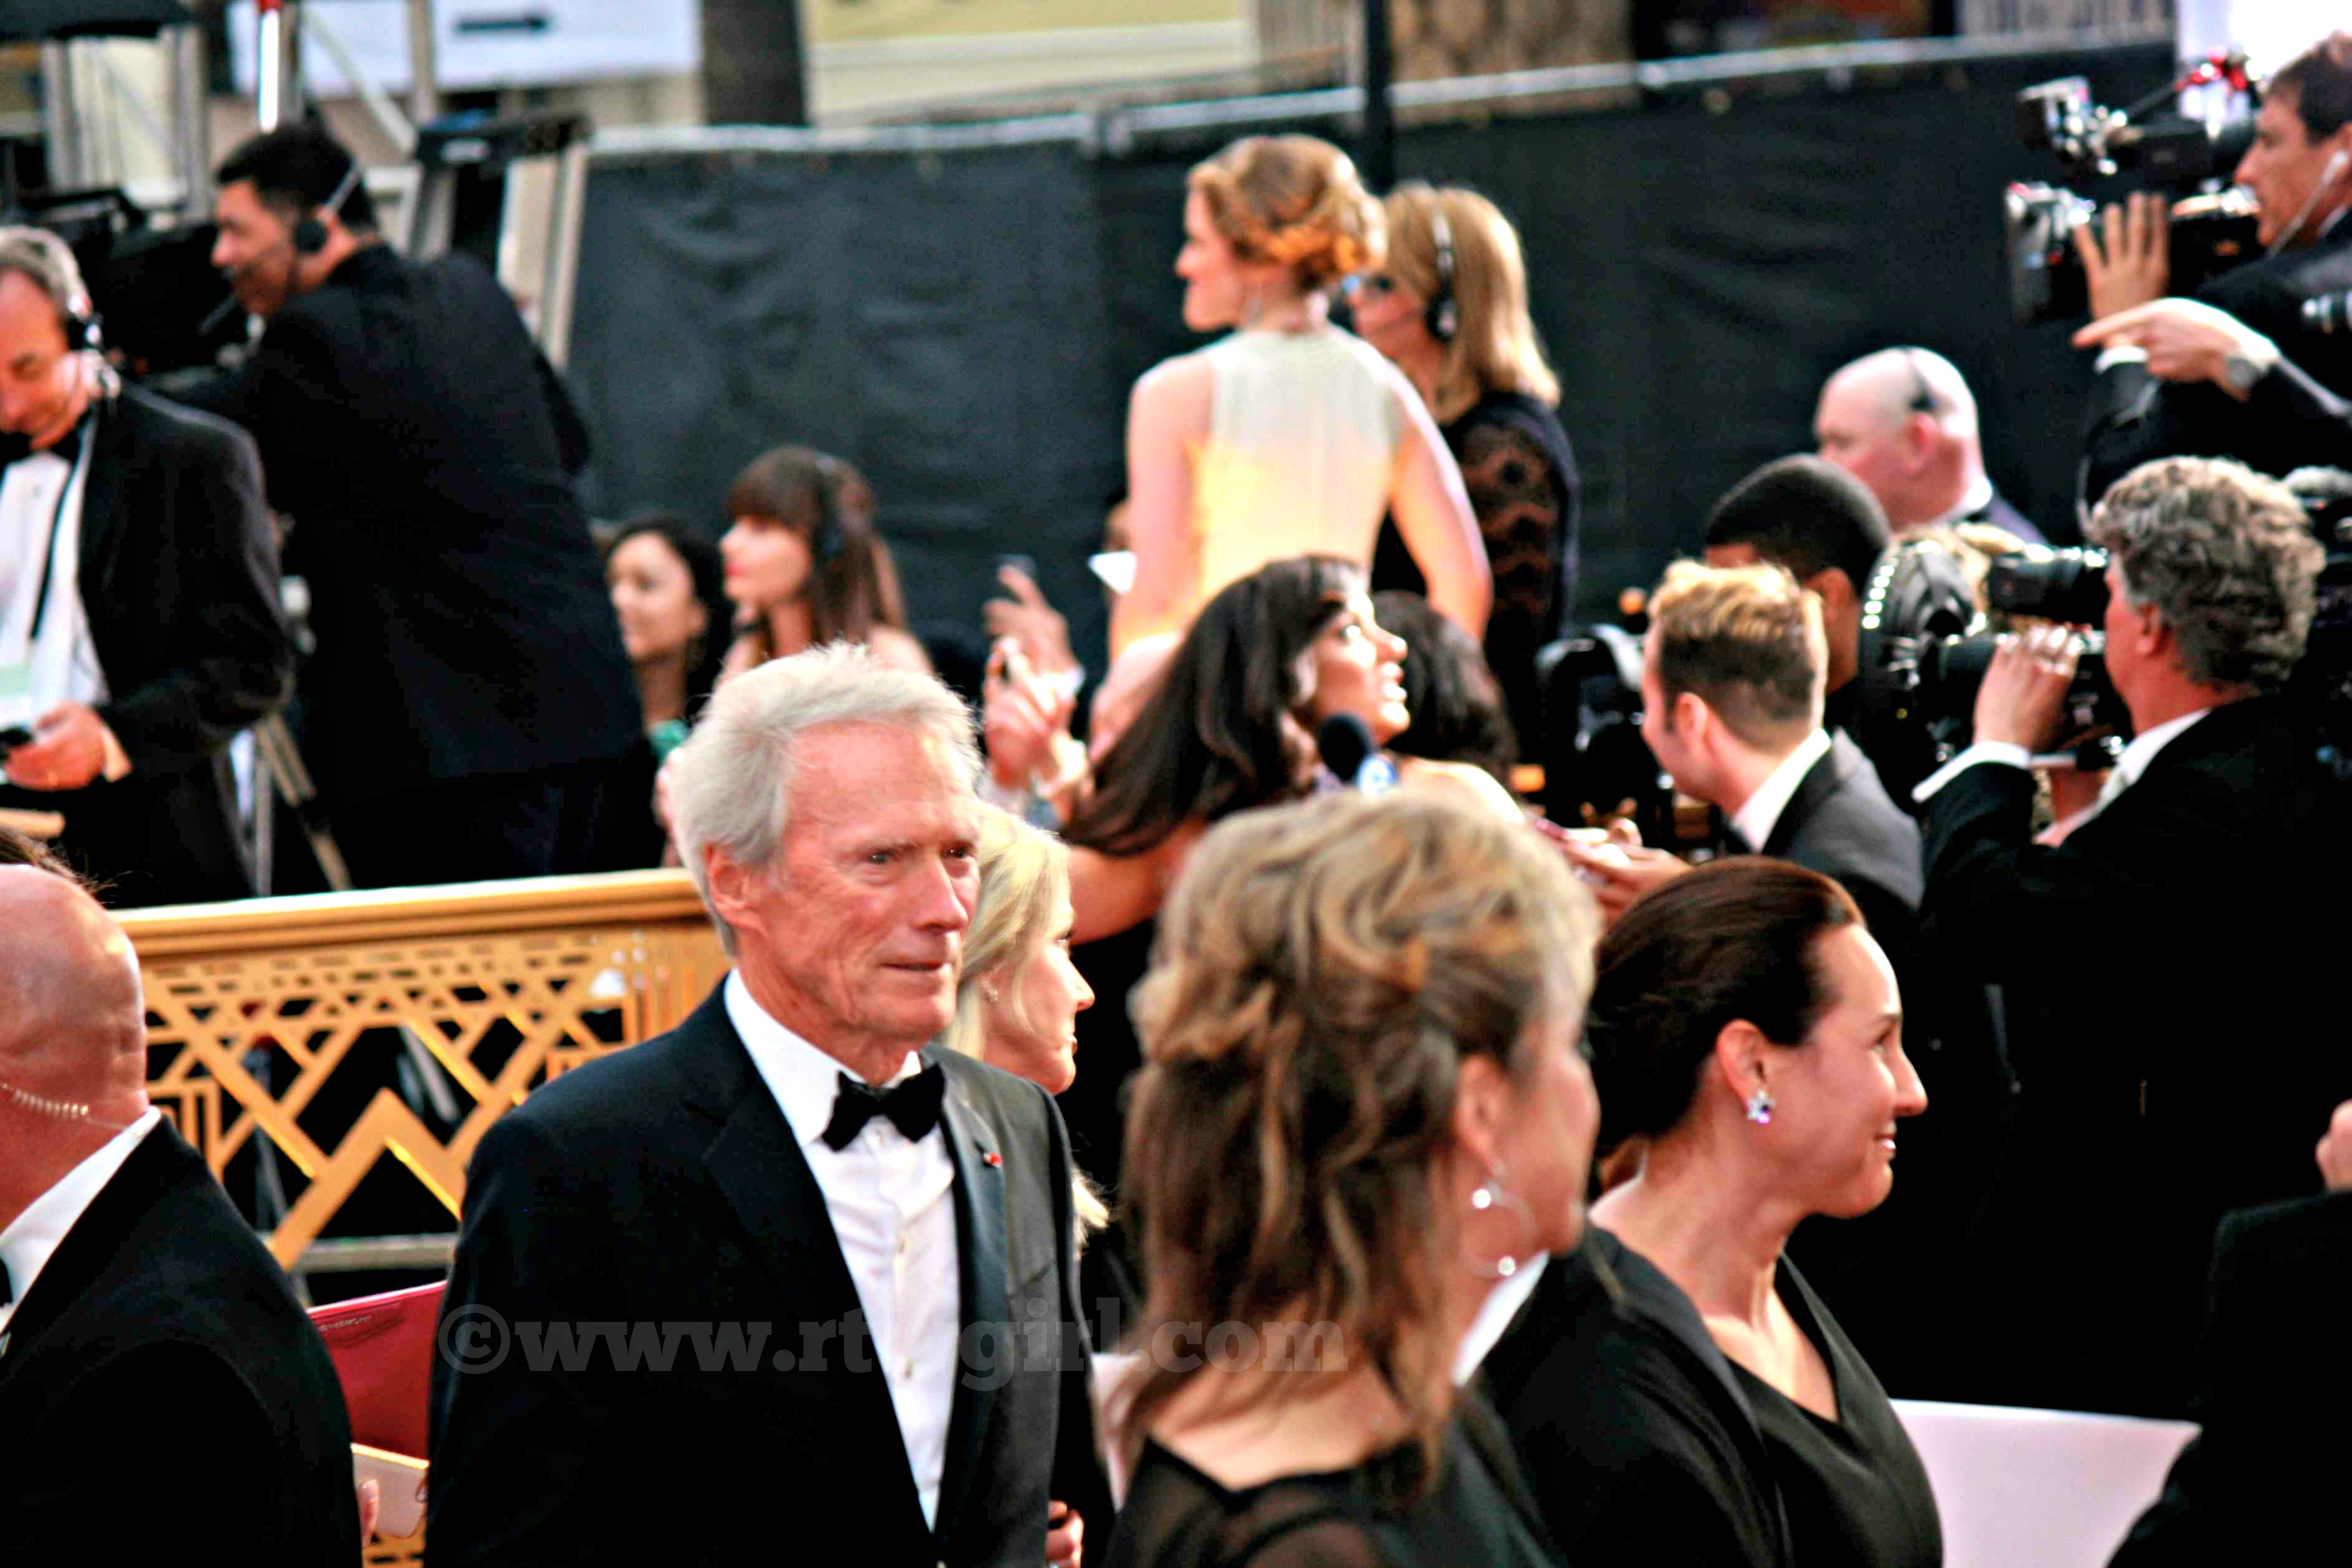 Clint Eastwood Watermark